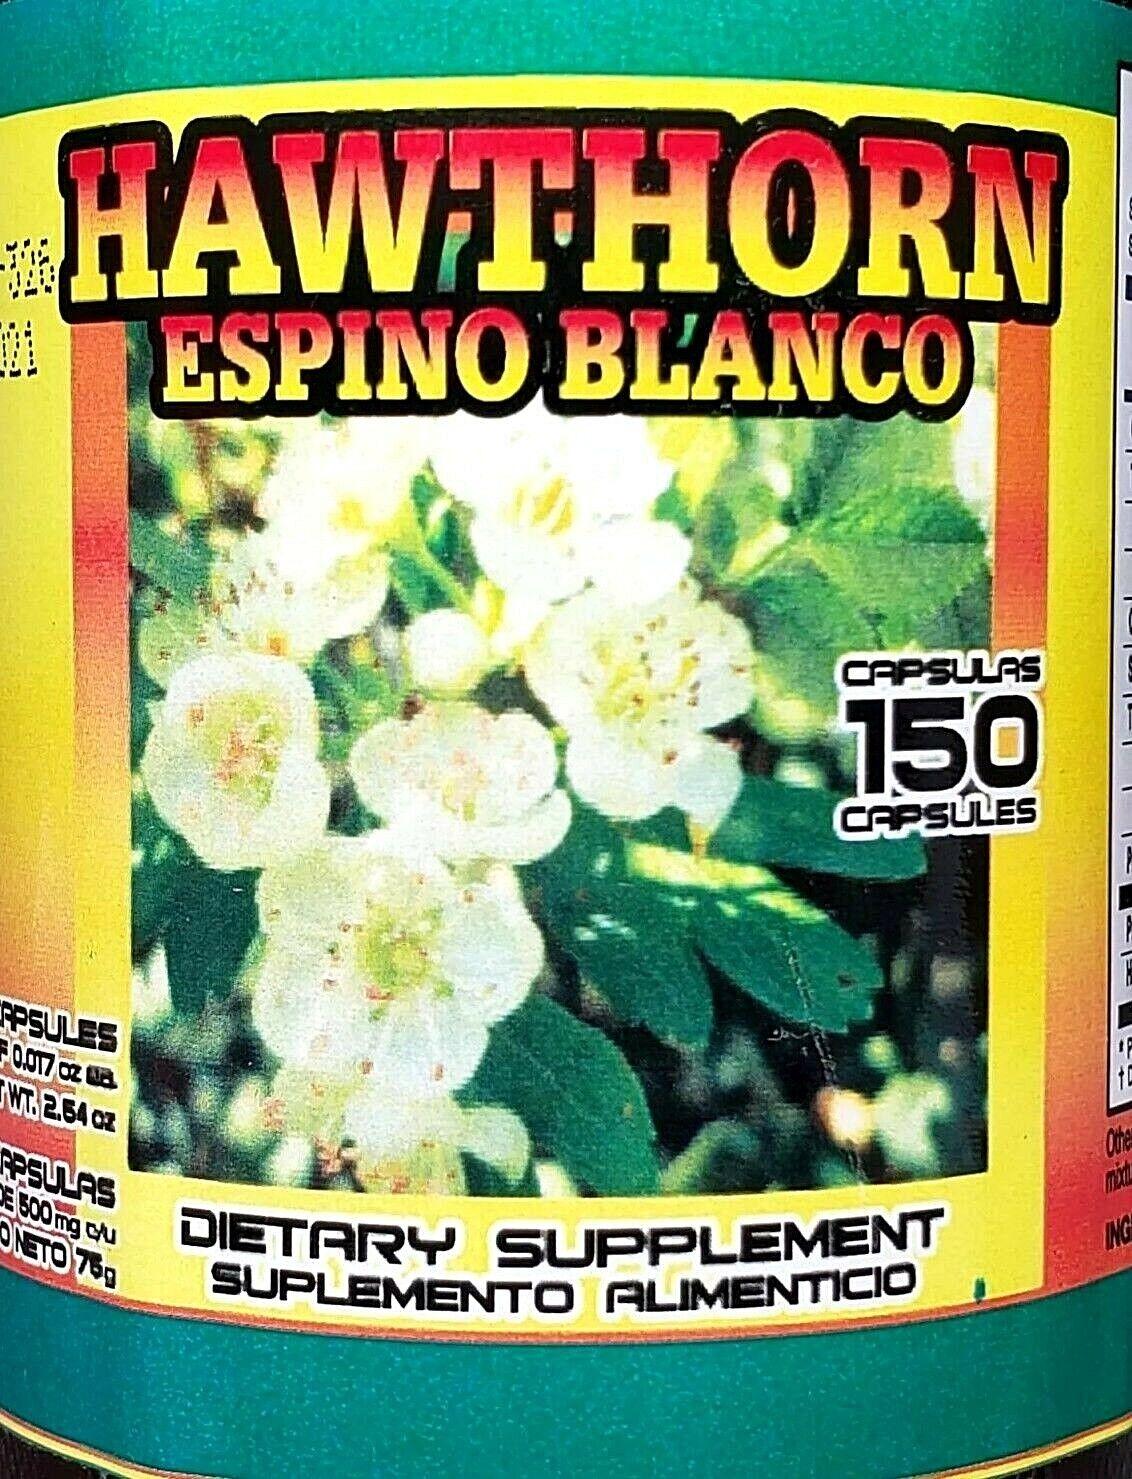 (3 Packs) ESPINO BLANCO HAWTHORN 450 CAPSULES 500MG EACH HEART PLANT Exp 06/2021 3